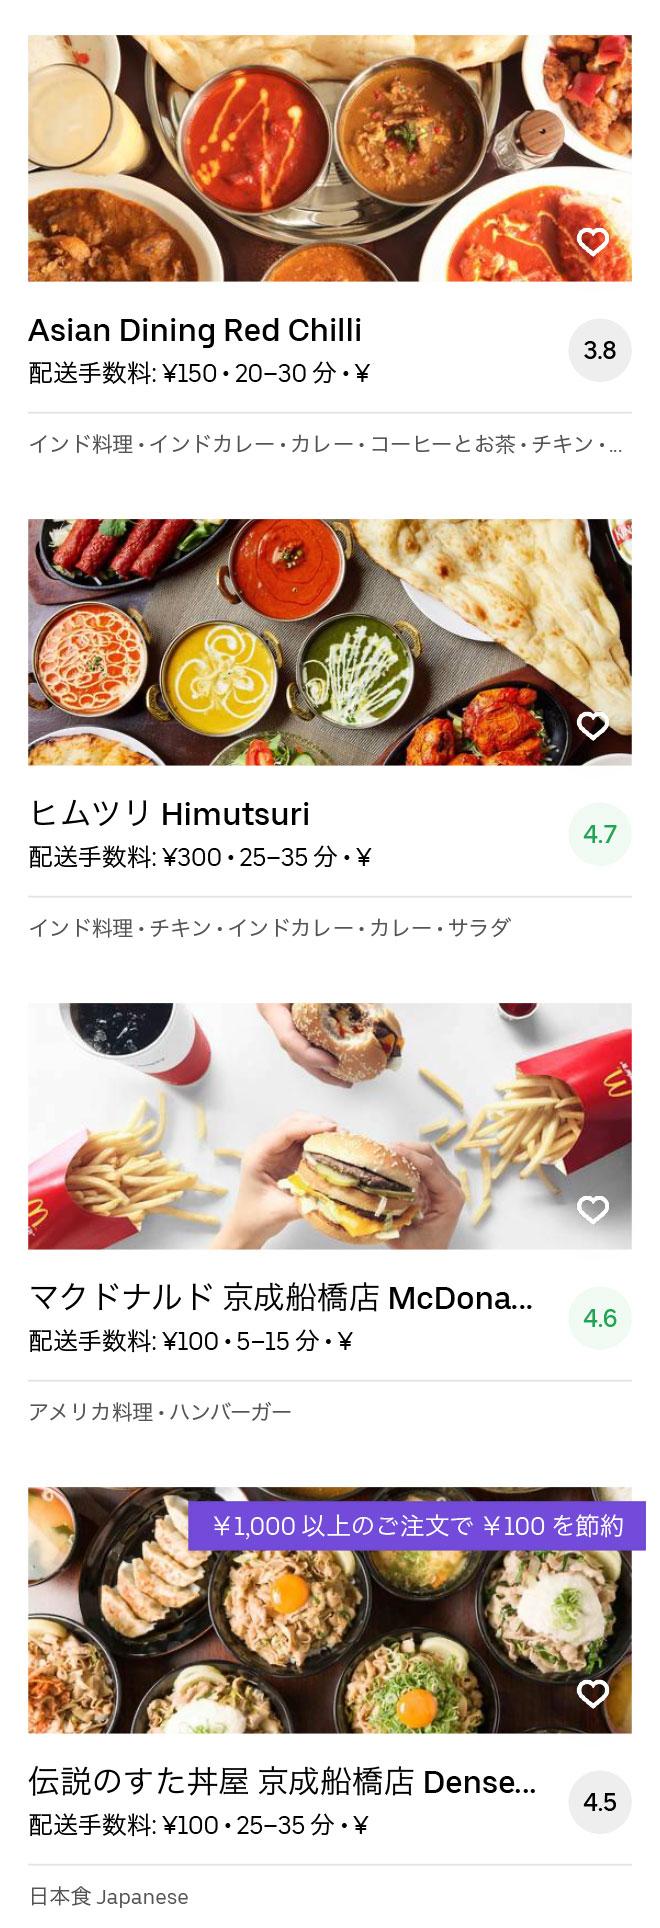 Funabashi menu 2004 11